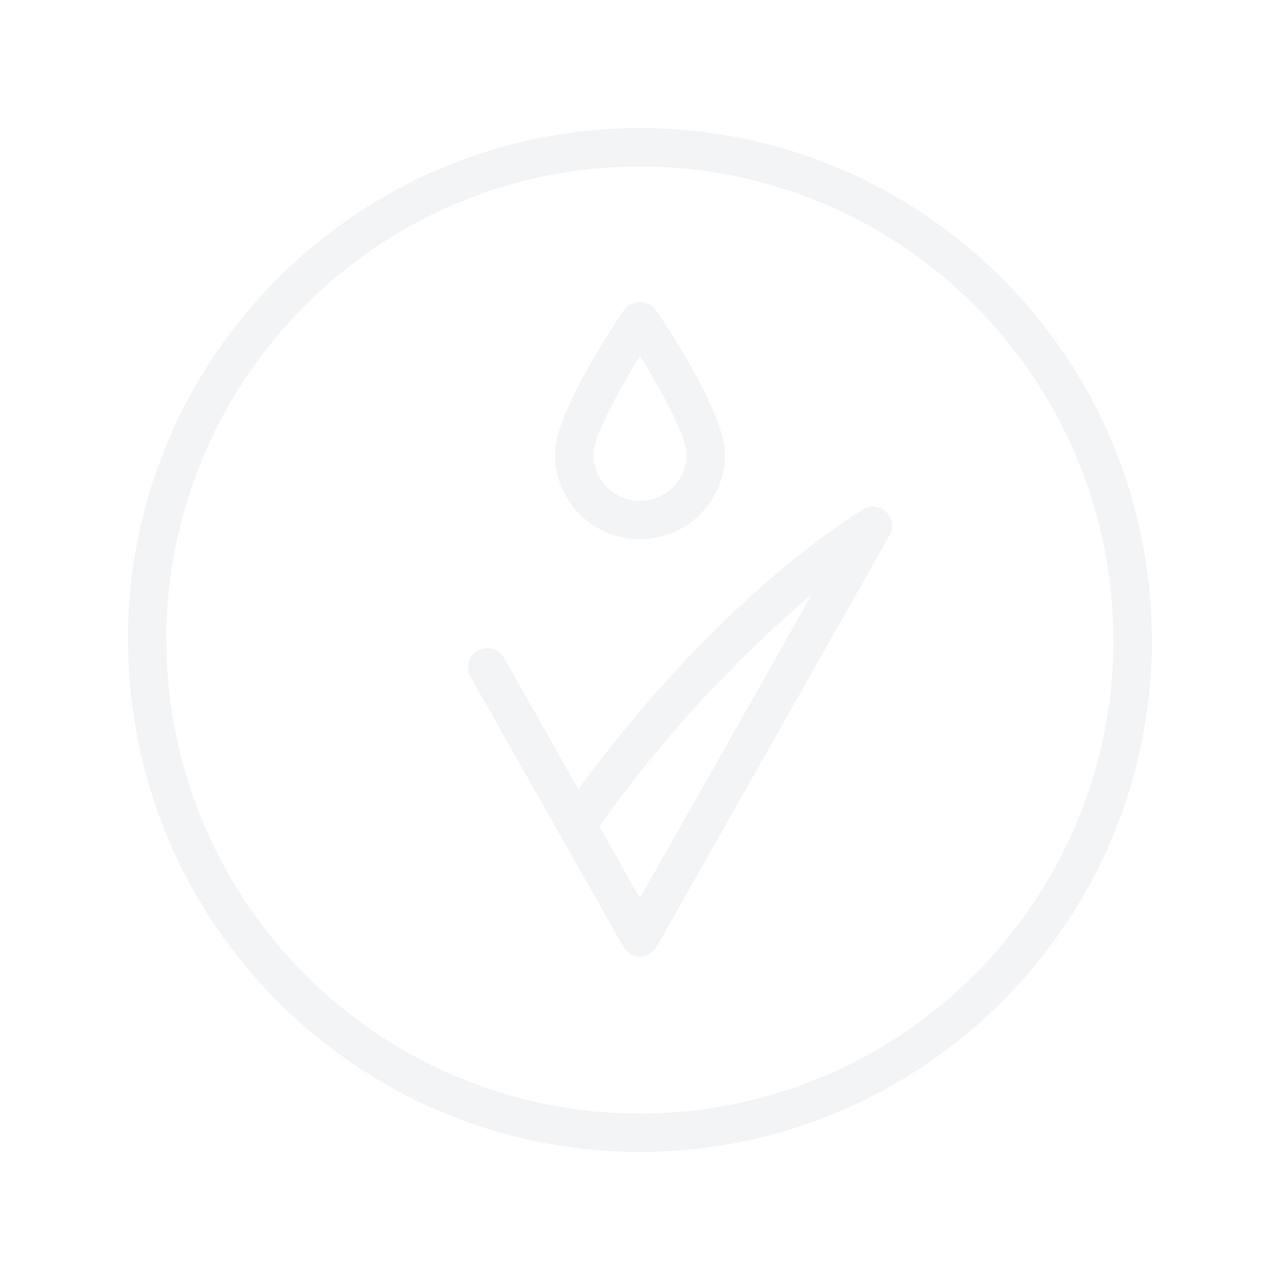 Hermes Twilly Dhermes 50ml Eau De Parfum Gift Set Loverte